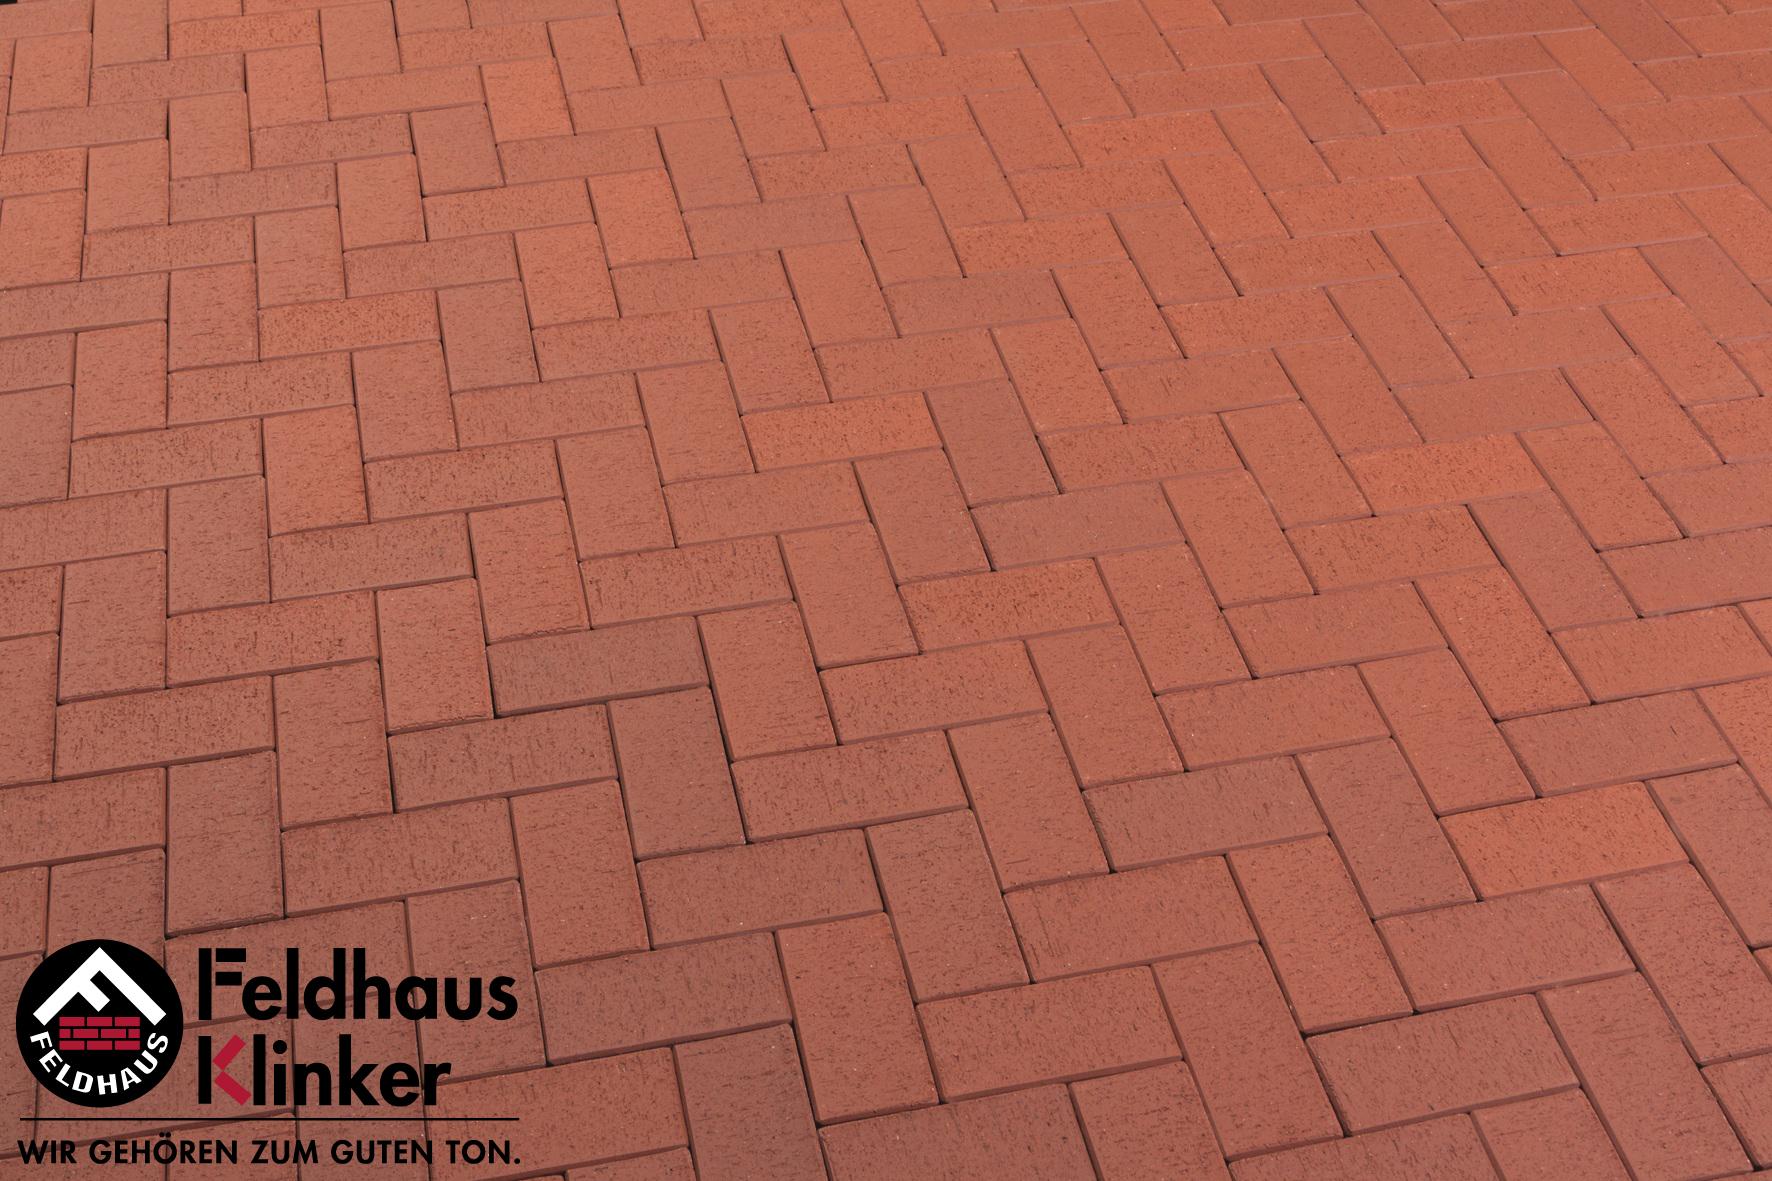 P402 Тротуарная плитка Feldhaus Klinker 16